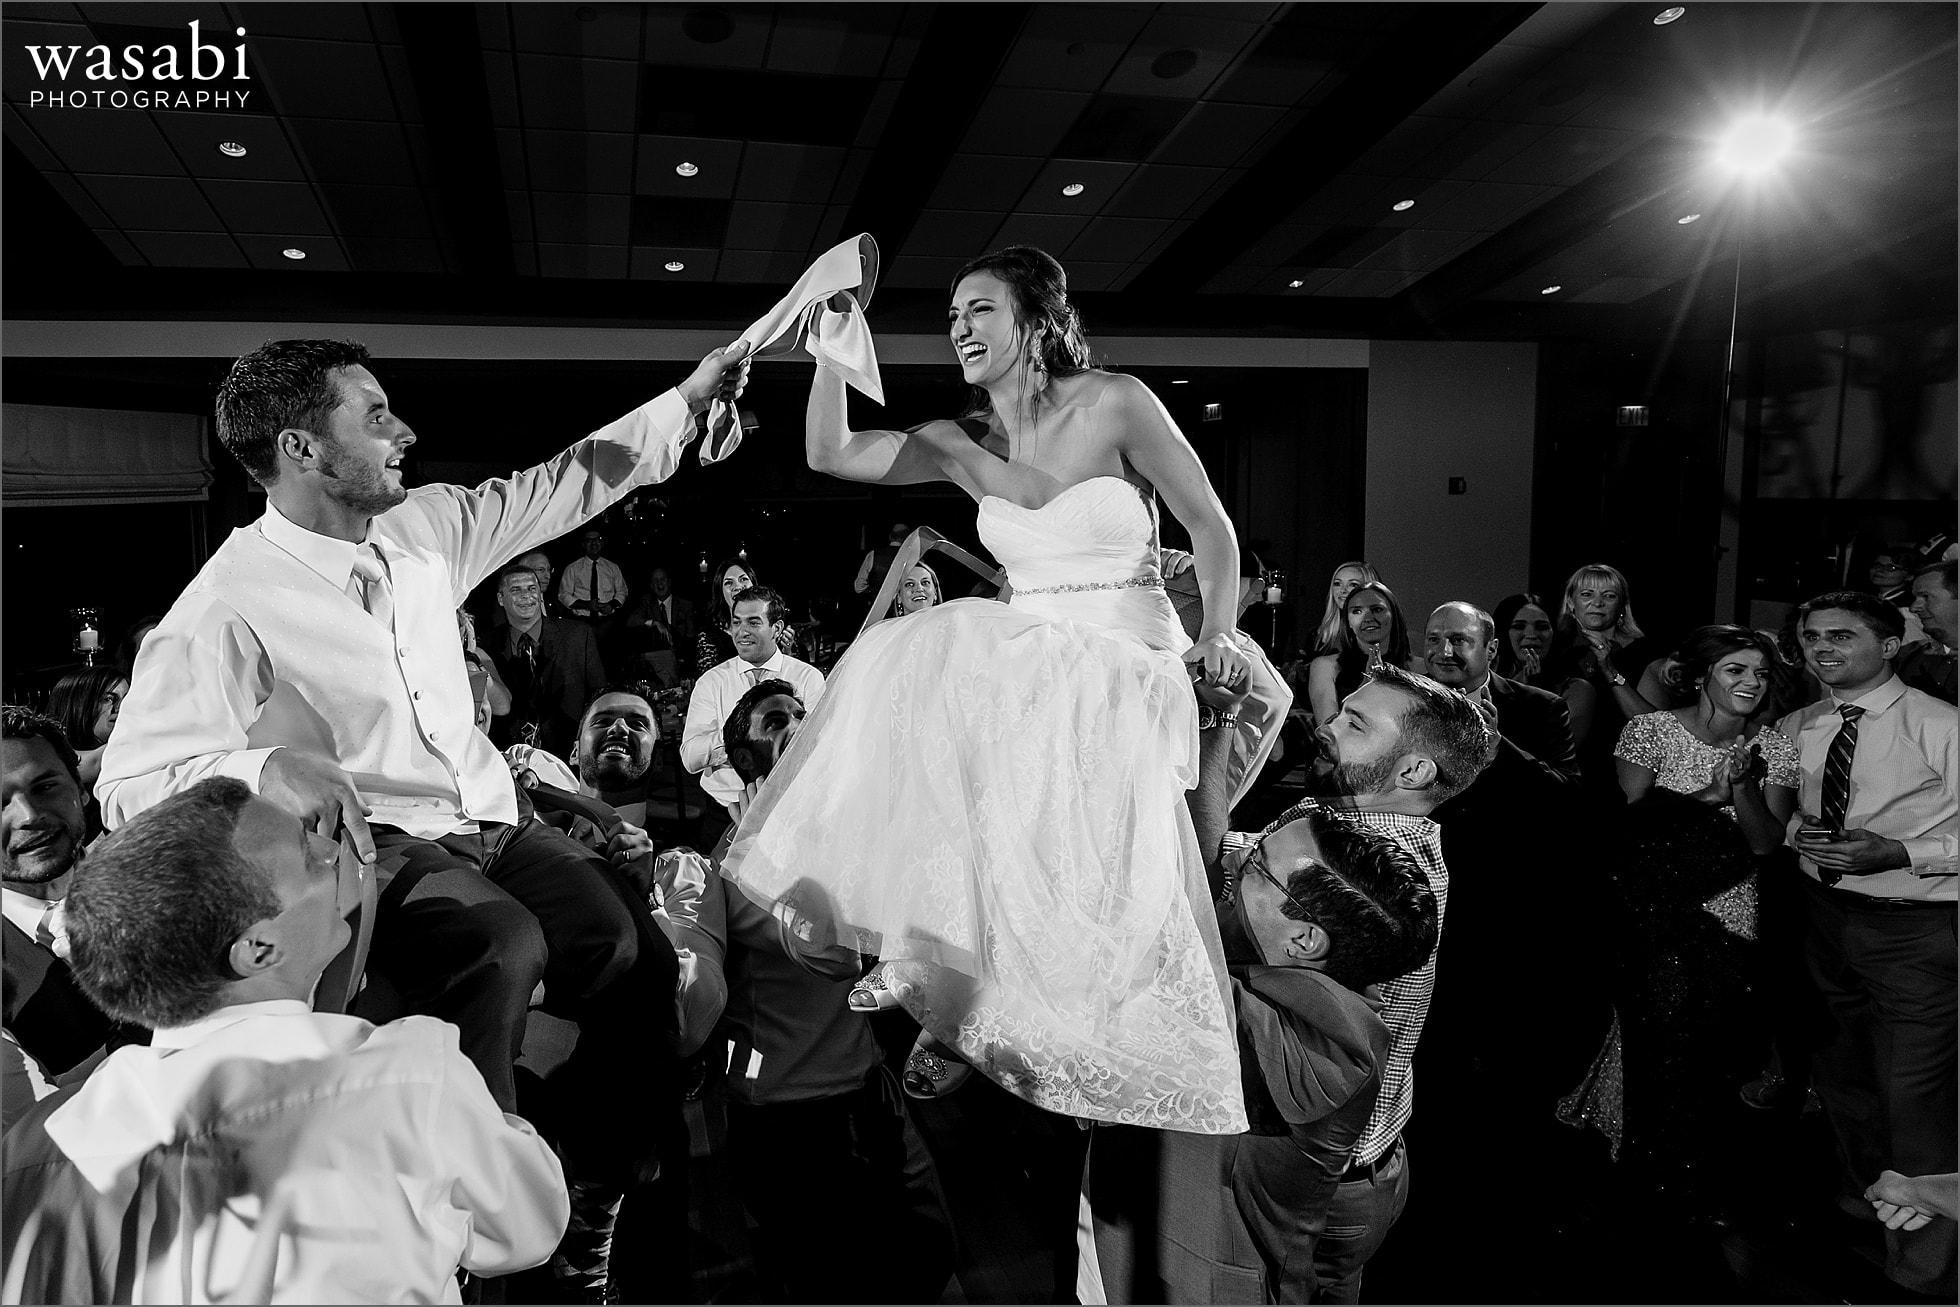 ivanhoe country club hora dance wedding photos